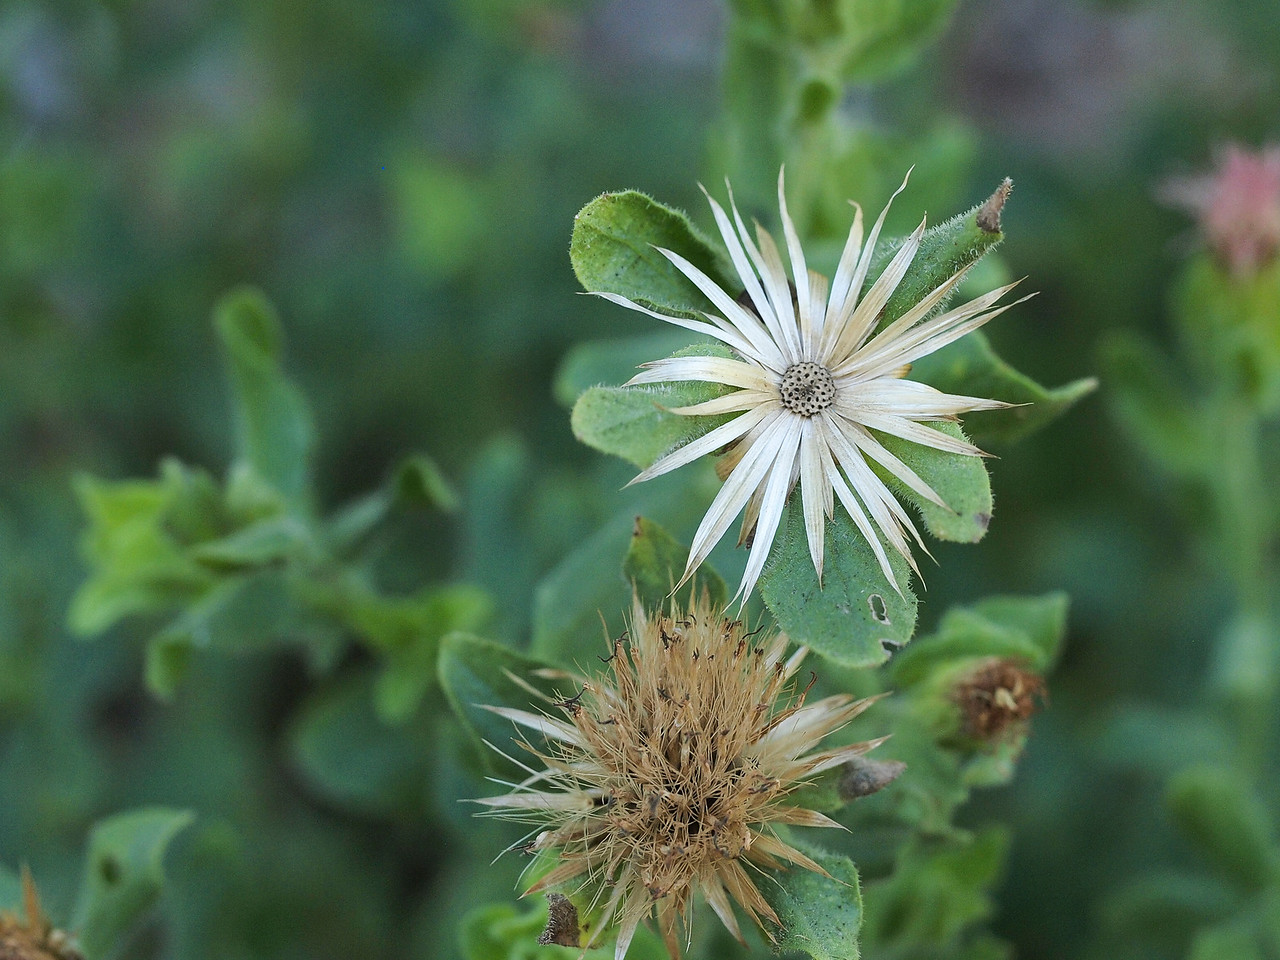 Greene's Brickellbush - Brickellia Greenei asteraceae